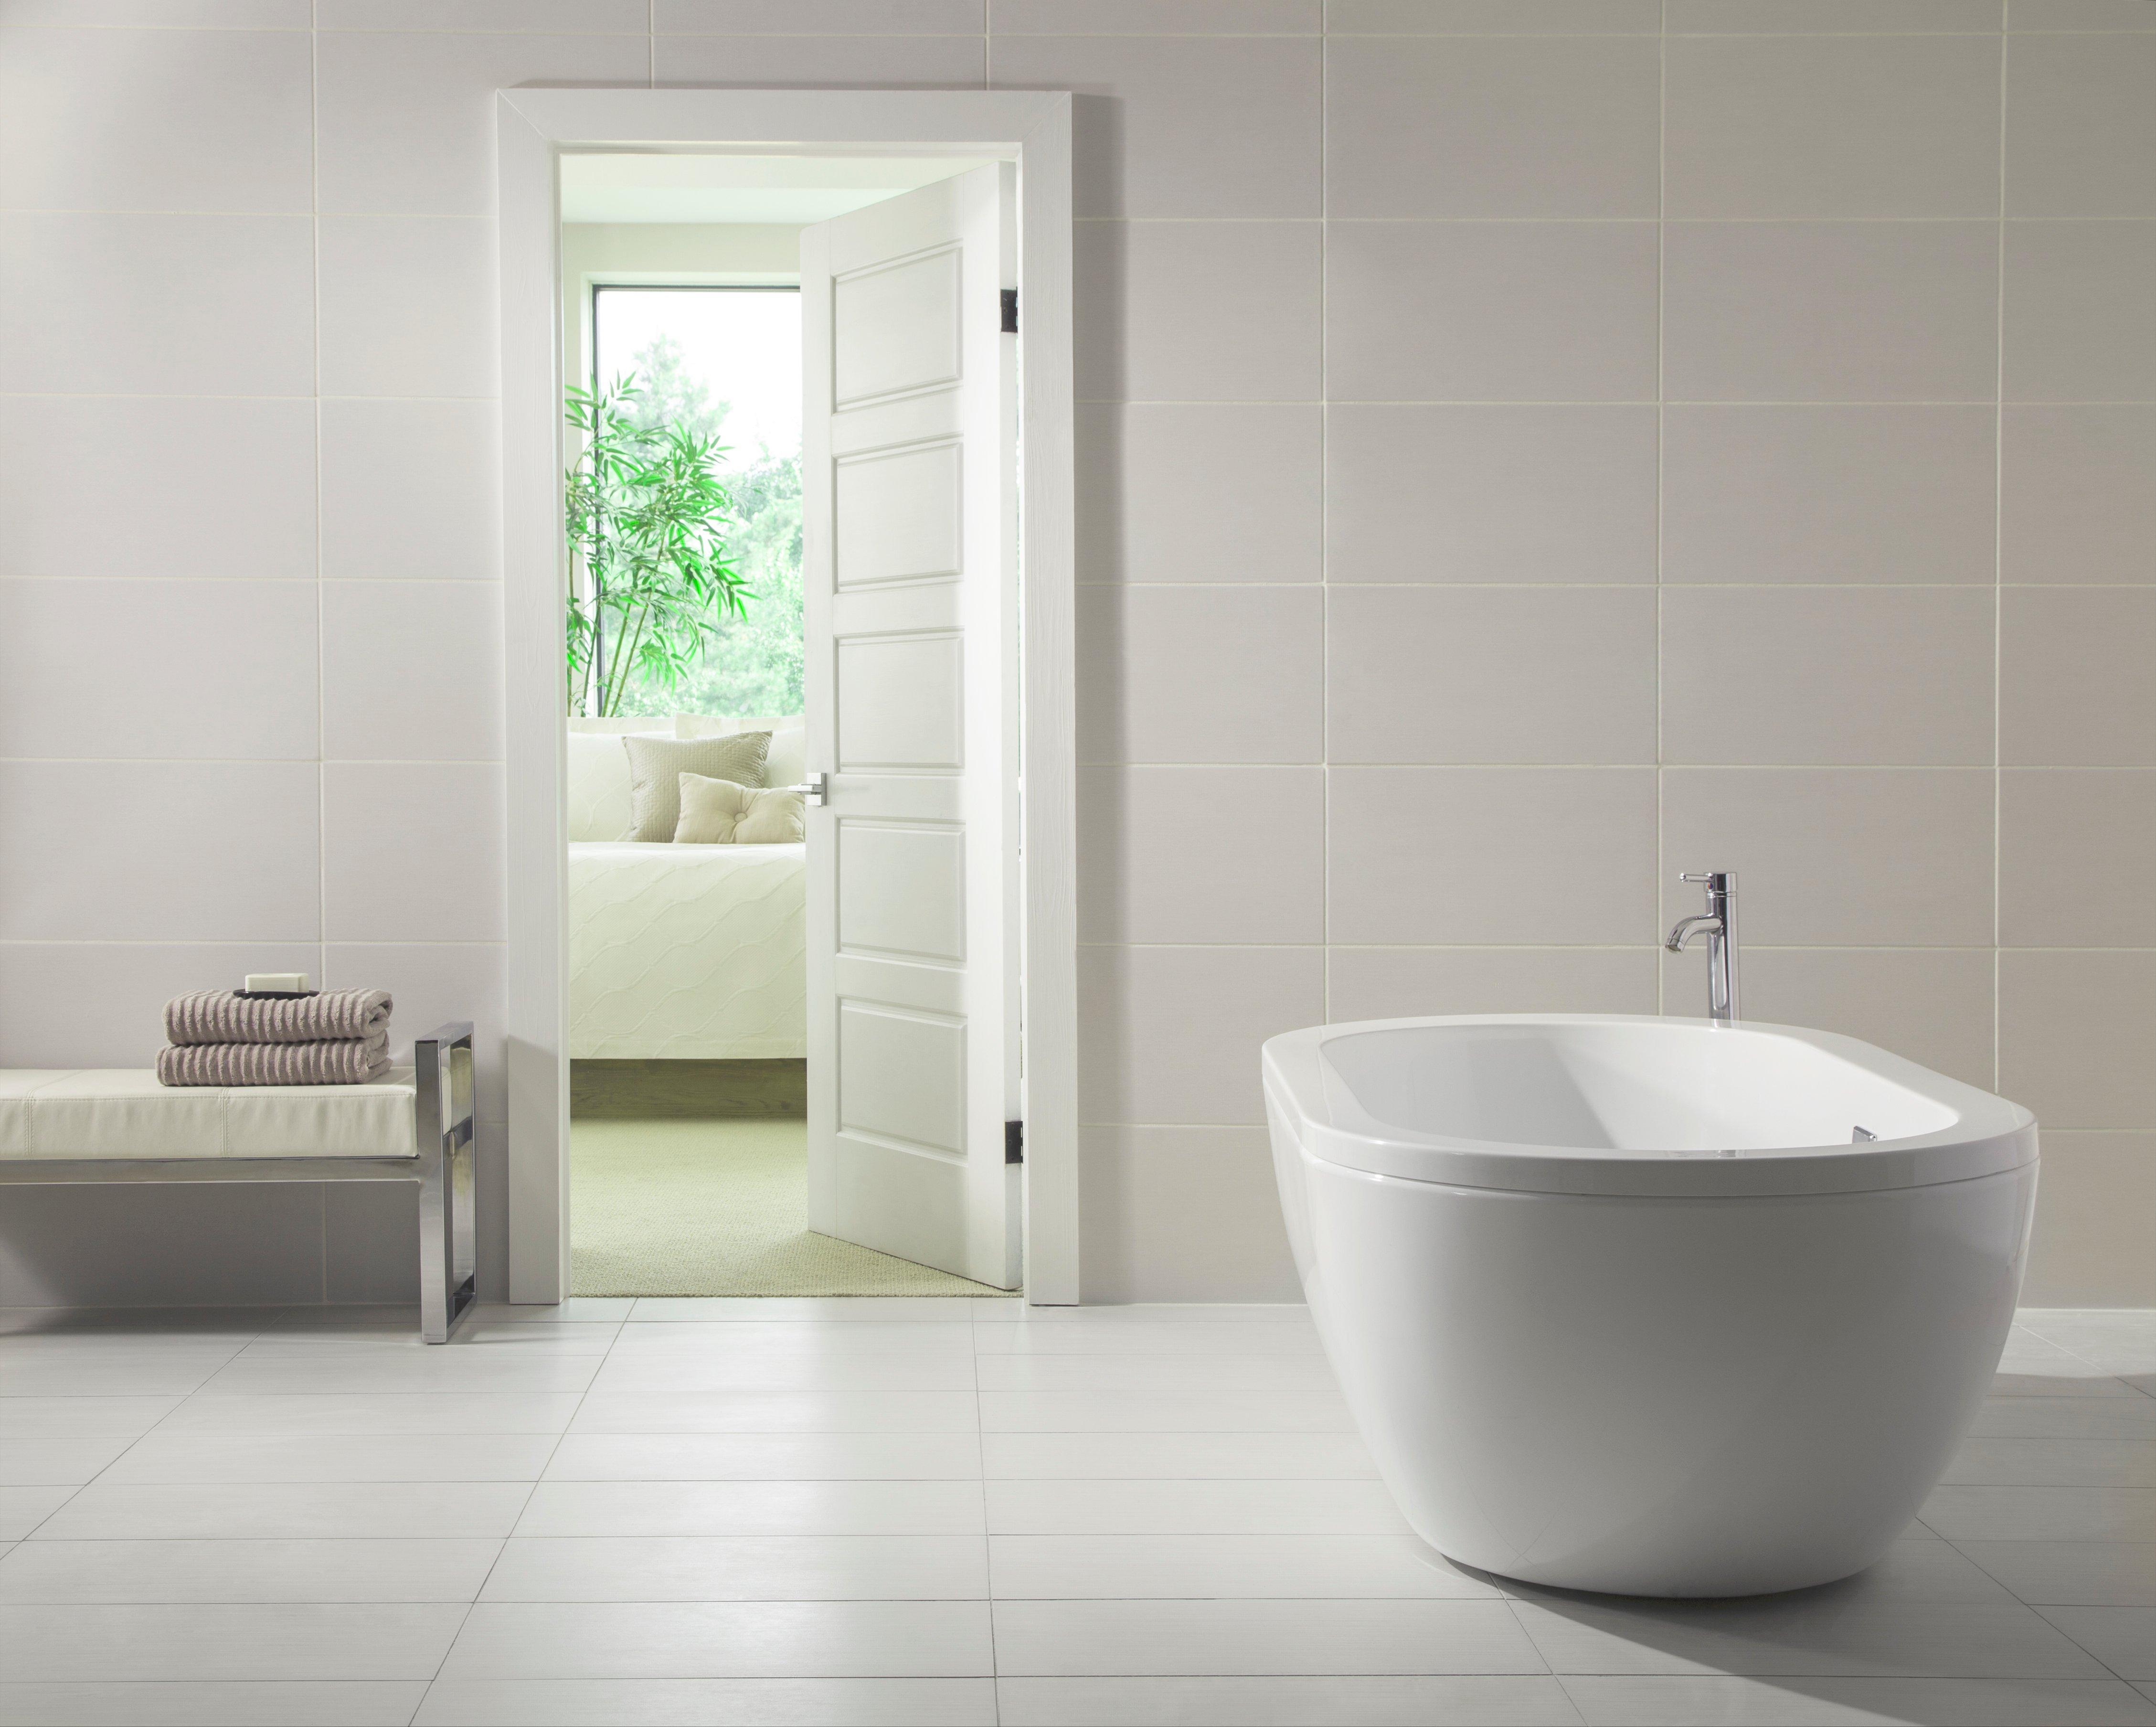 ... Idole Gray Ceramic Wall Bath Room. View Details